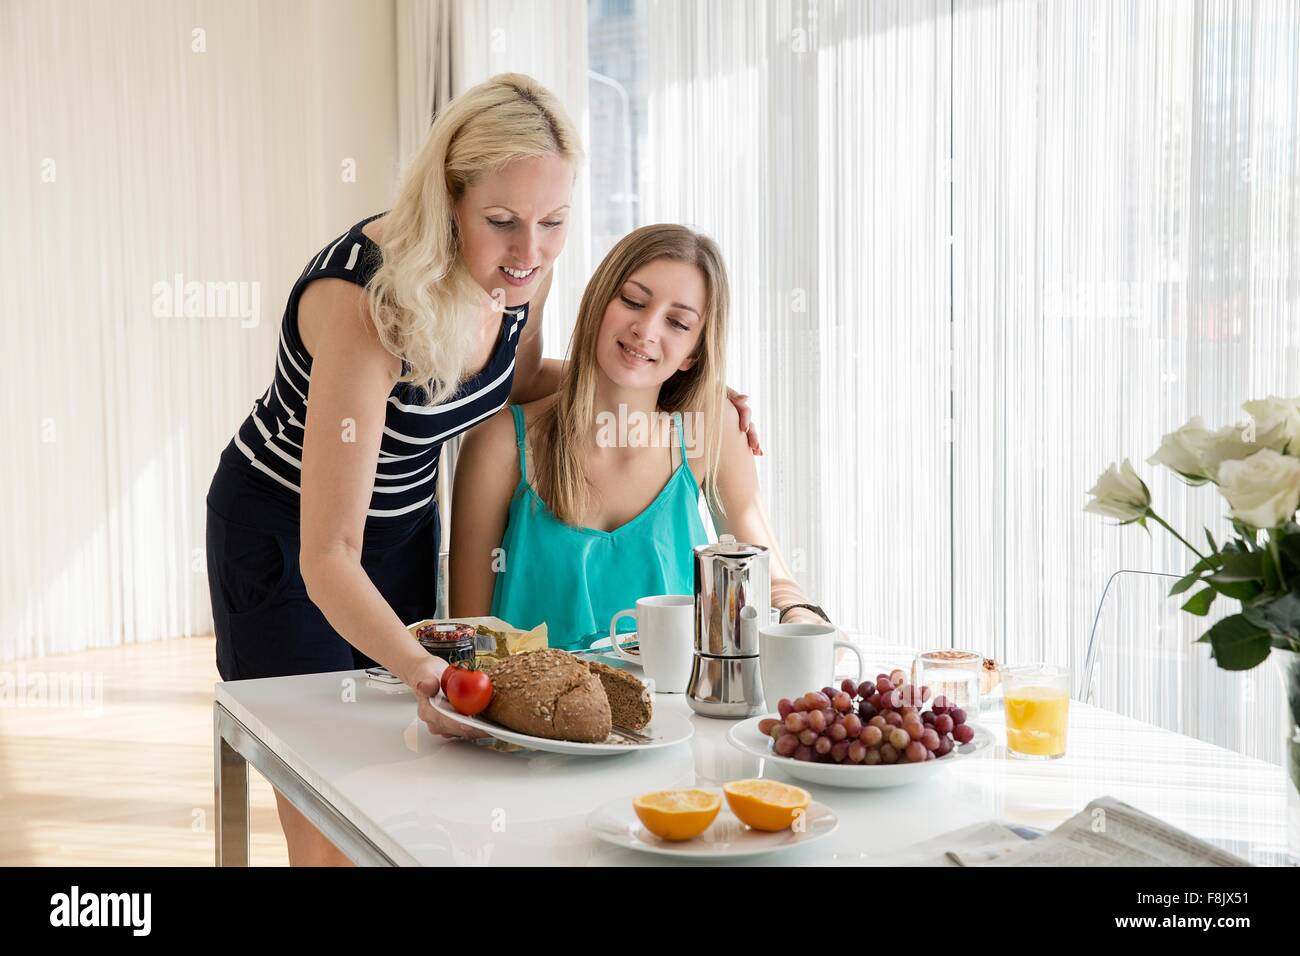 Woman serving friend continental breakfast - Stock Image